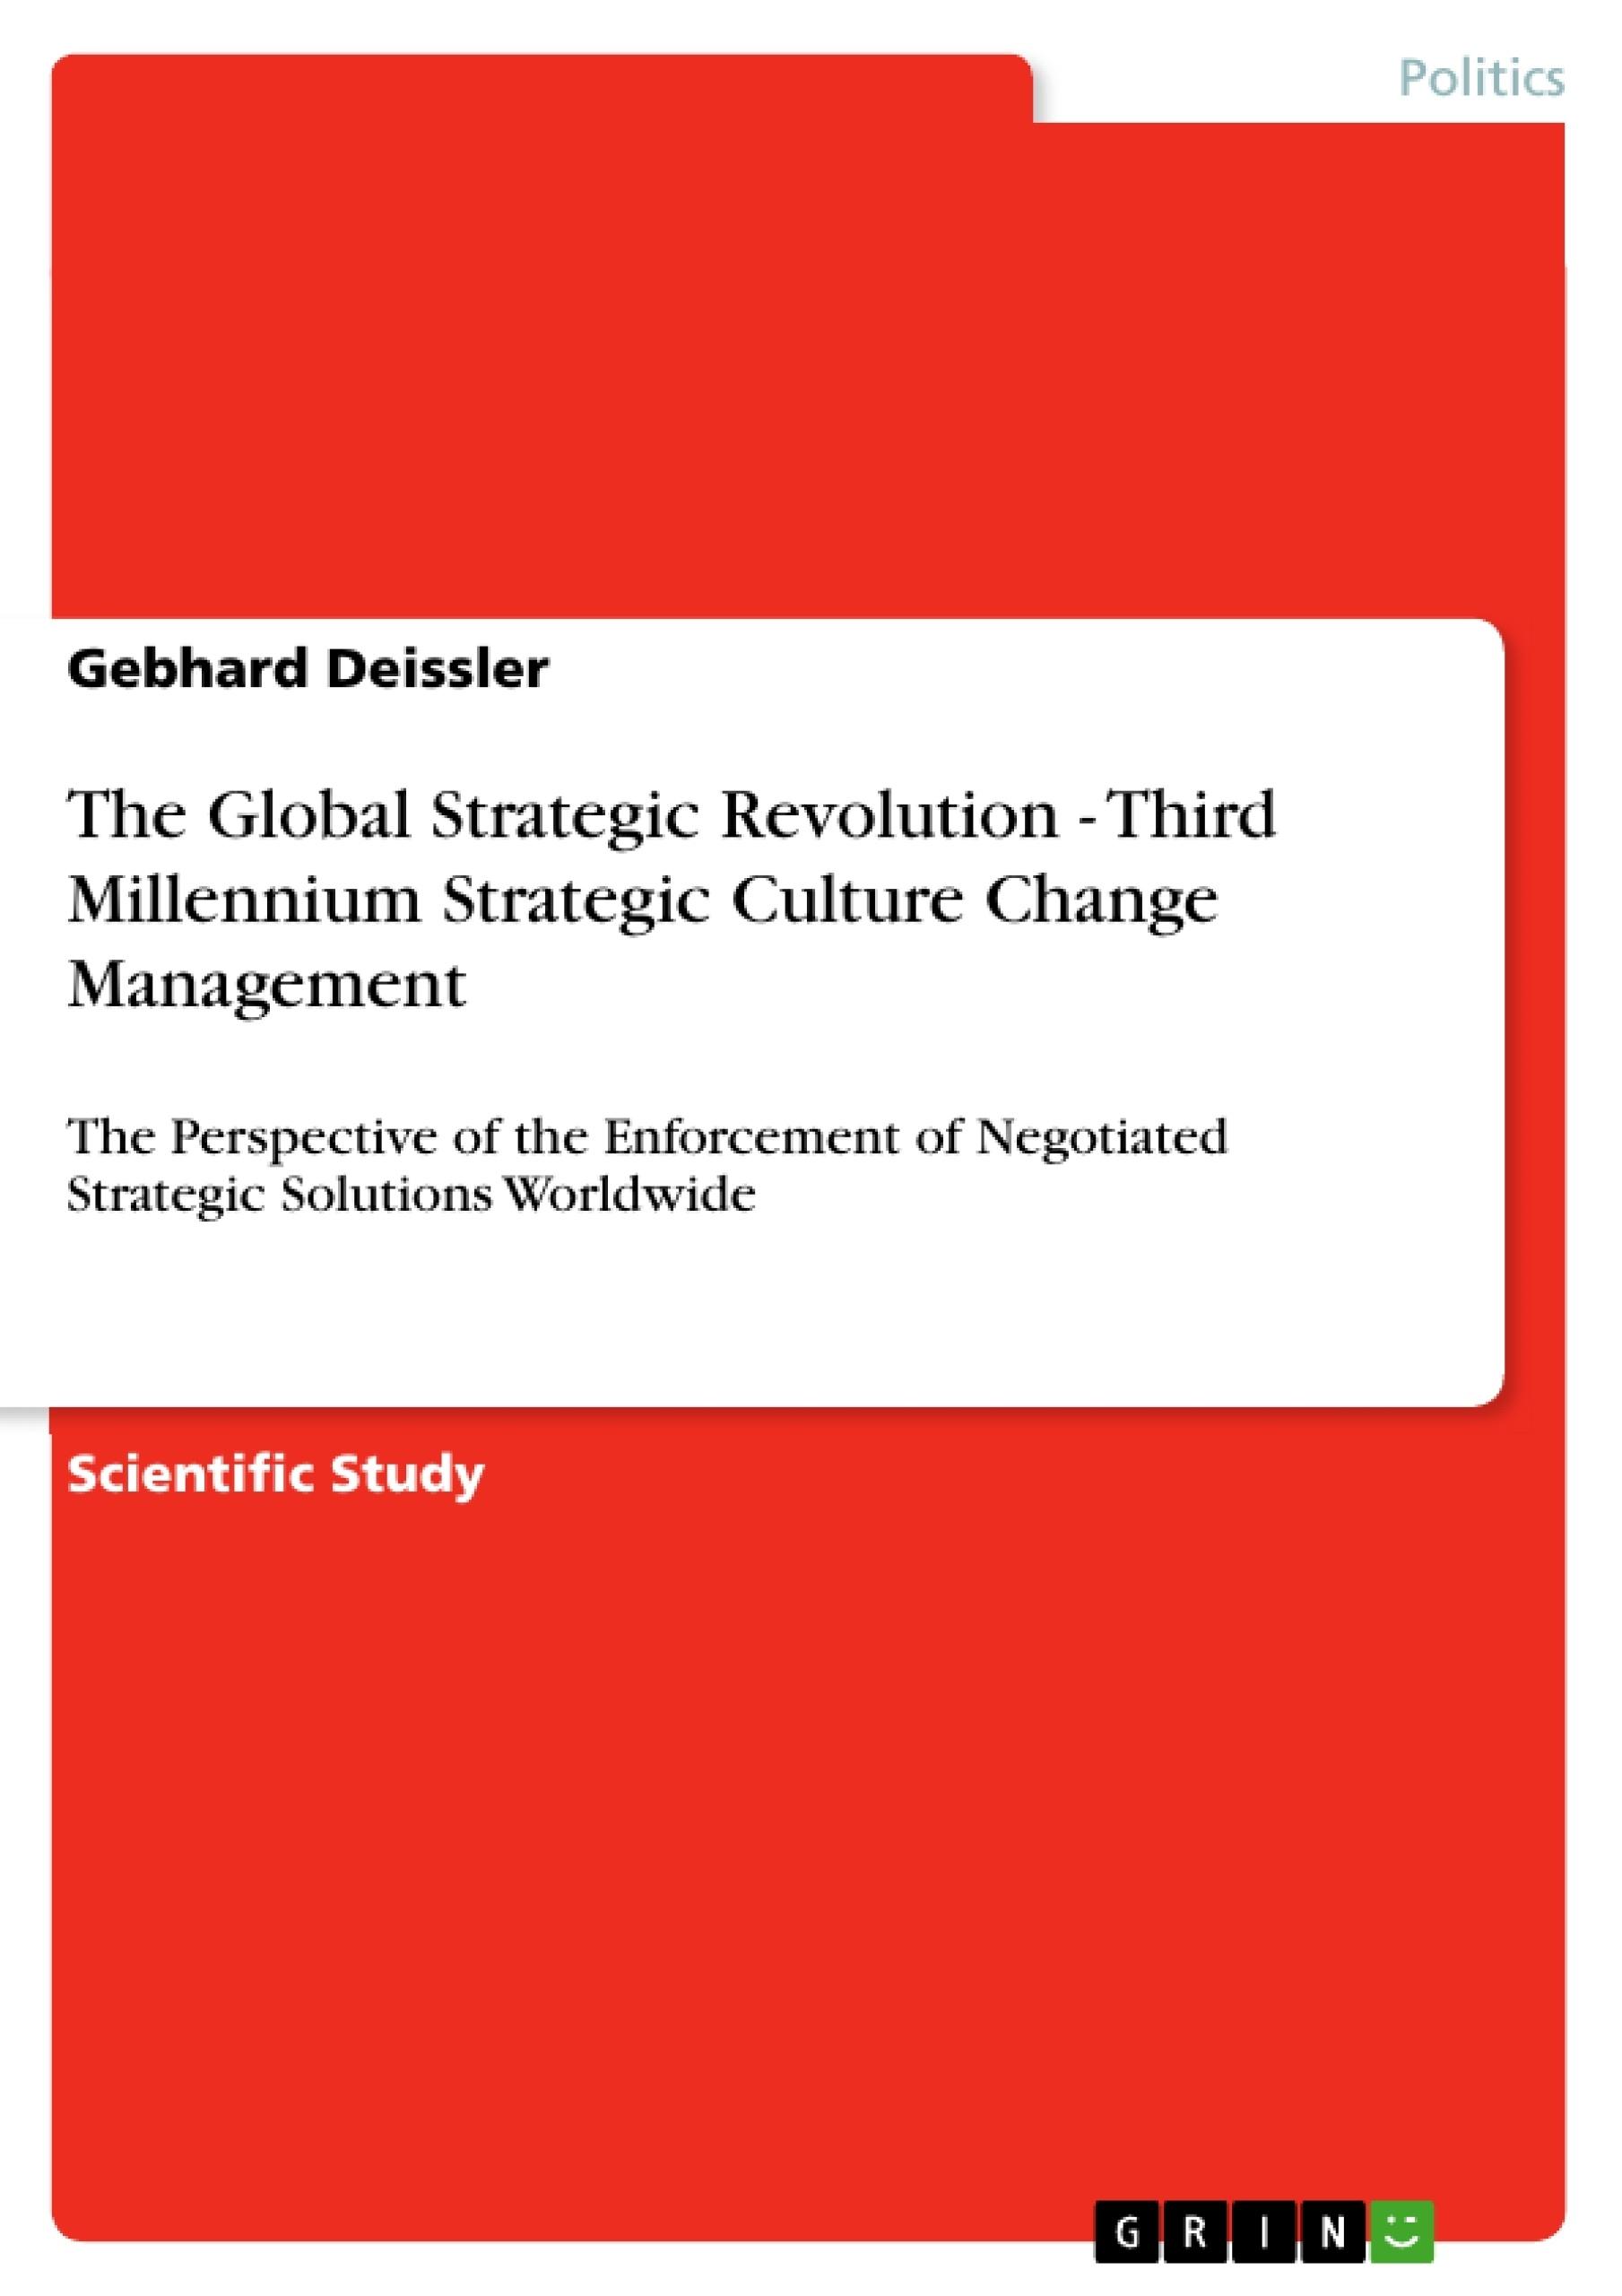 Title: The Global Strategic Revolution - Third Millennium Strategic Culture Change Management